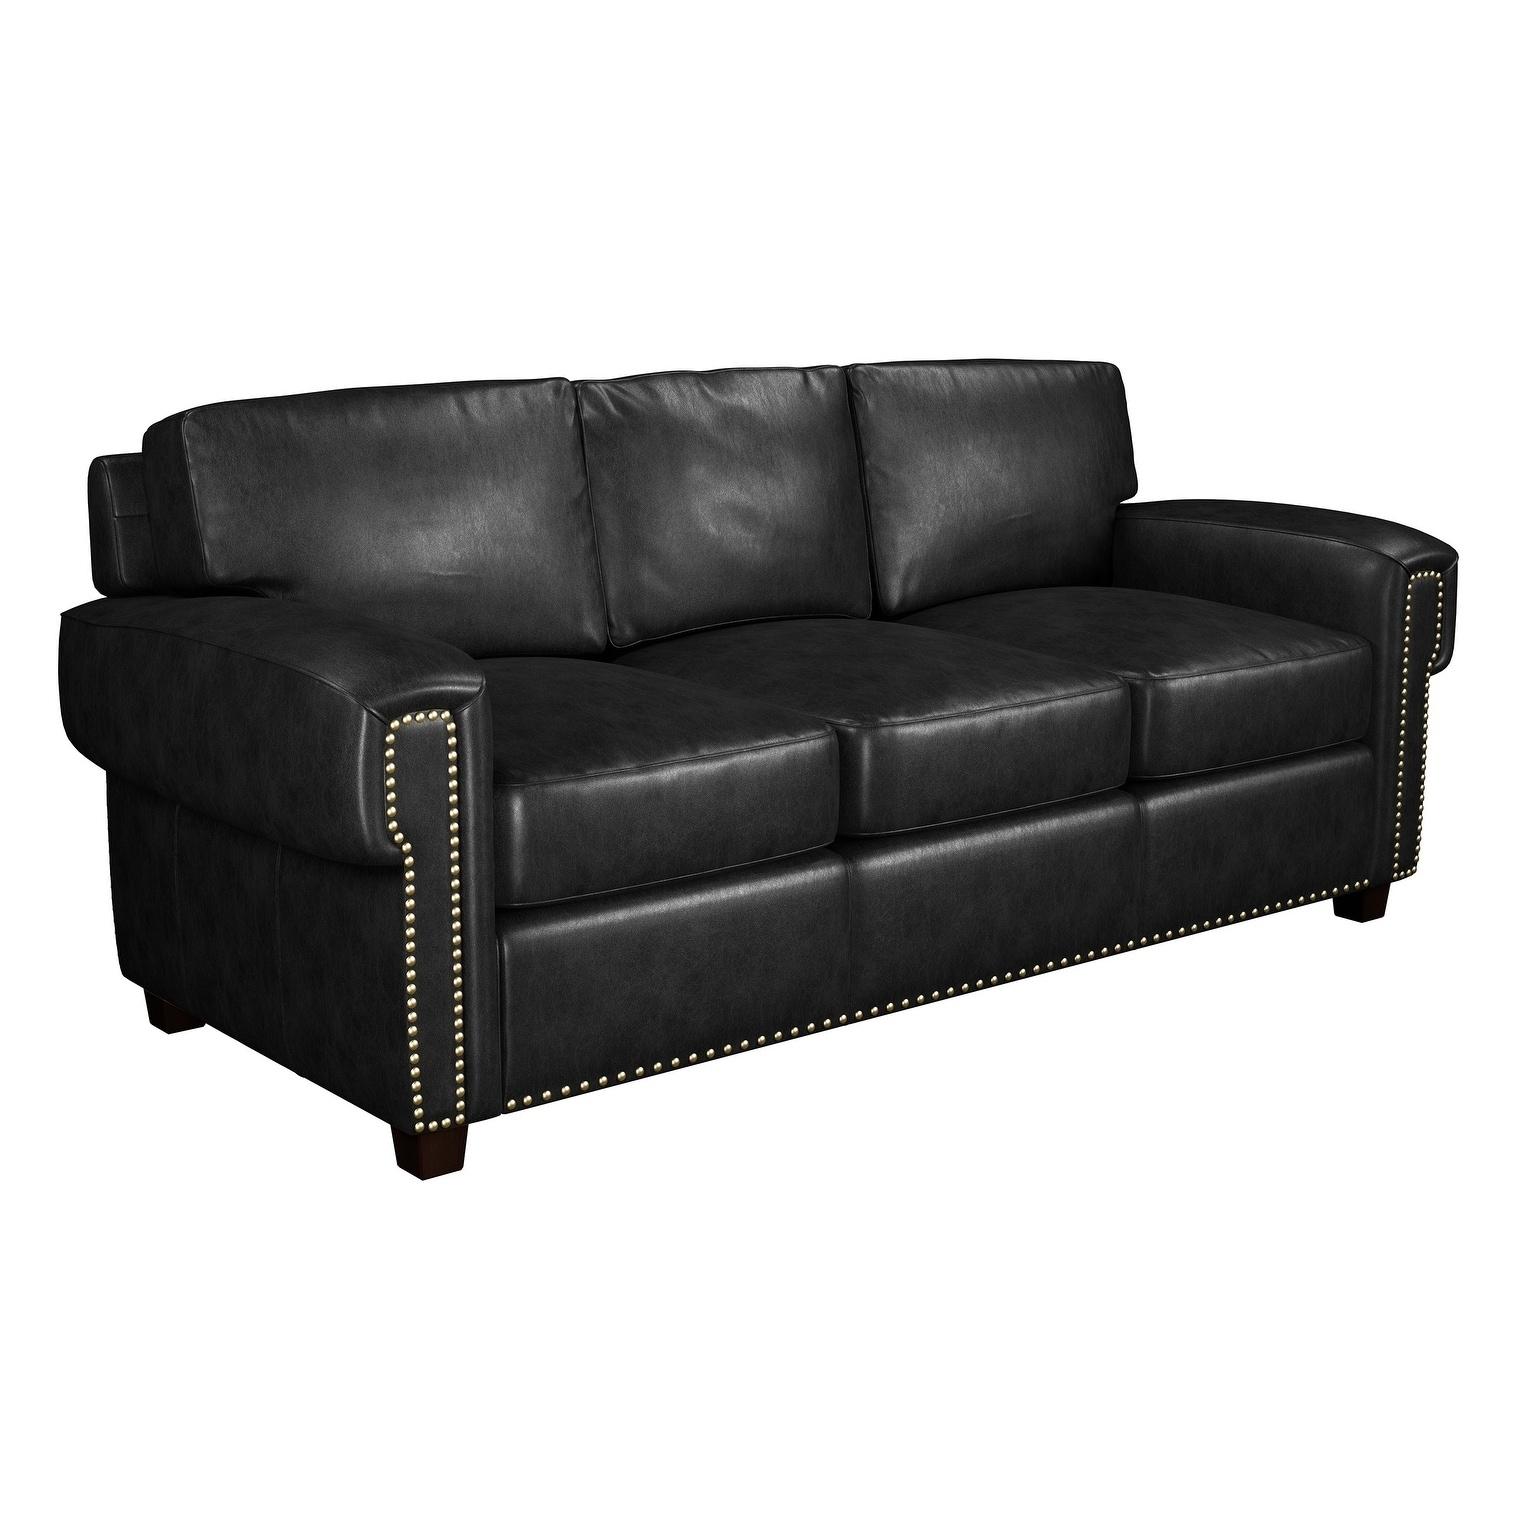 Shop Black Friday Deals On Made To Order Como 100 Top Grain Leather Queen Sleeper Sofa Overstock 23620554